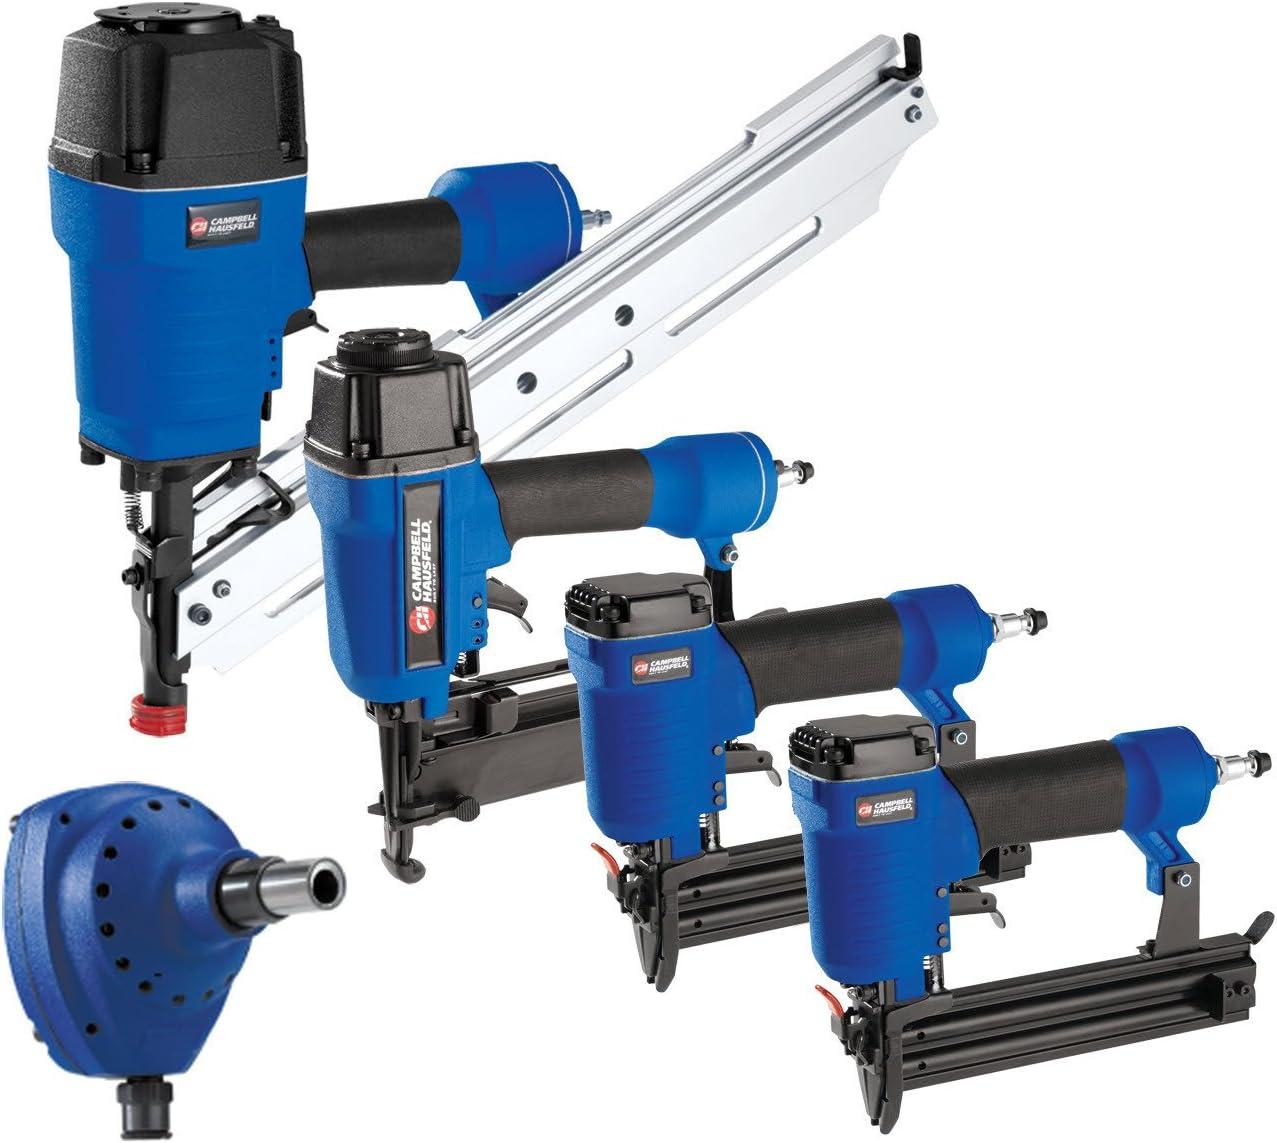 Campbell Hausfeld 5 Tool Framing Nailer Air Tool Kit Amazon Co Uk Diy Tools